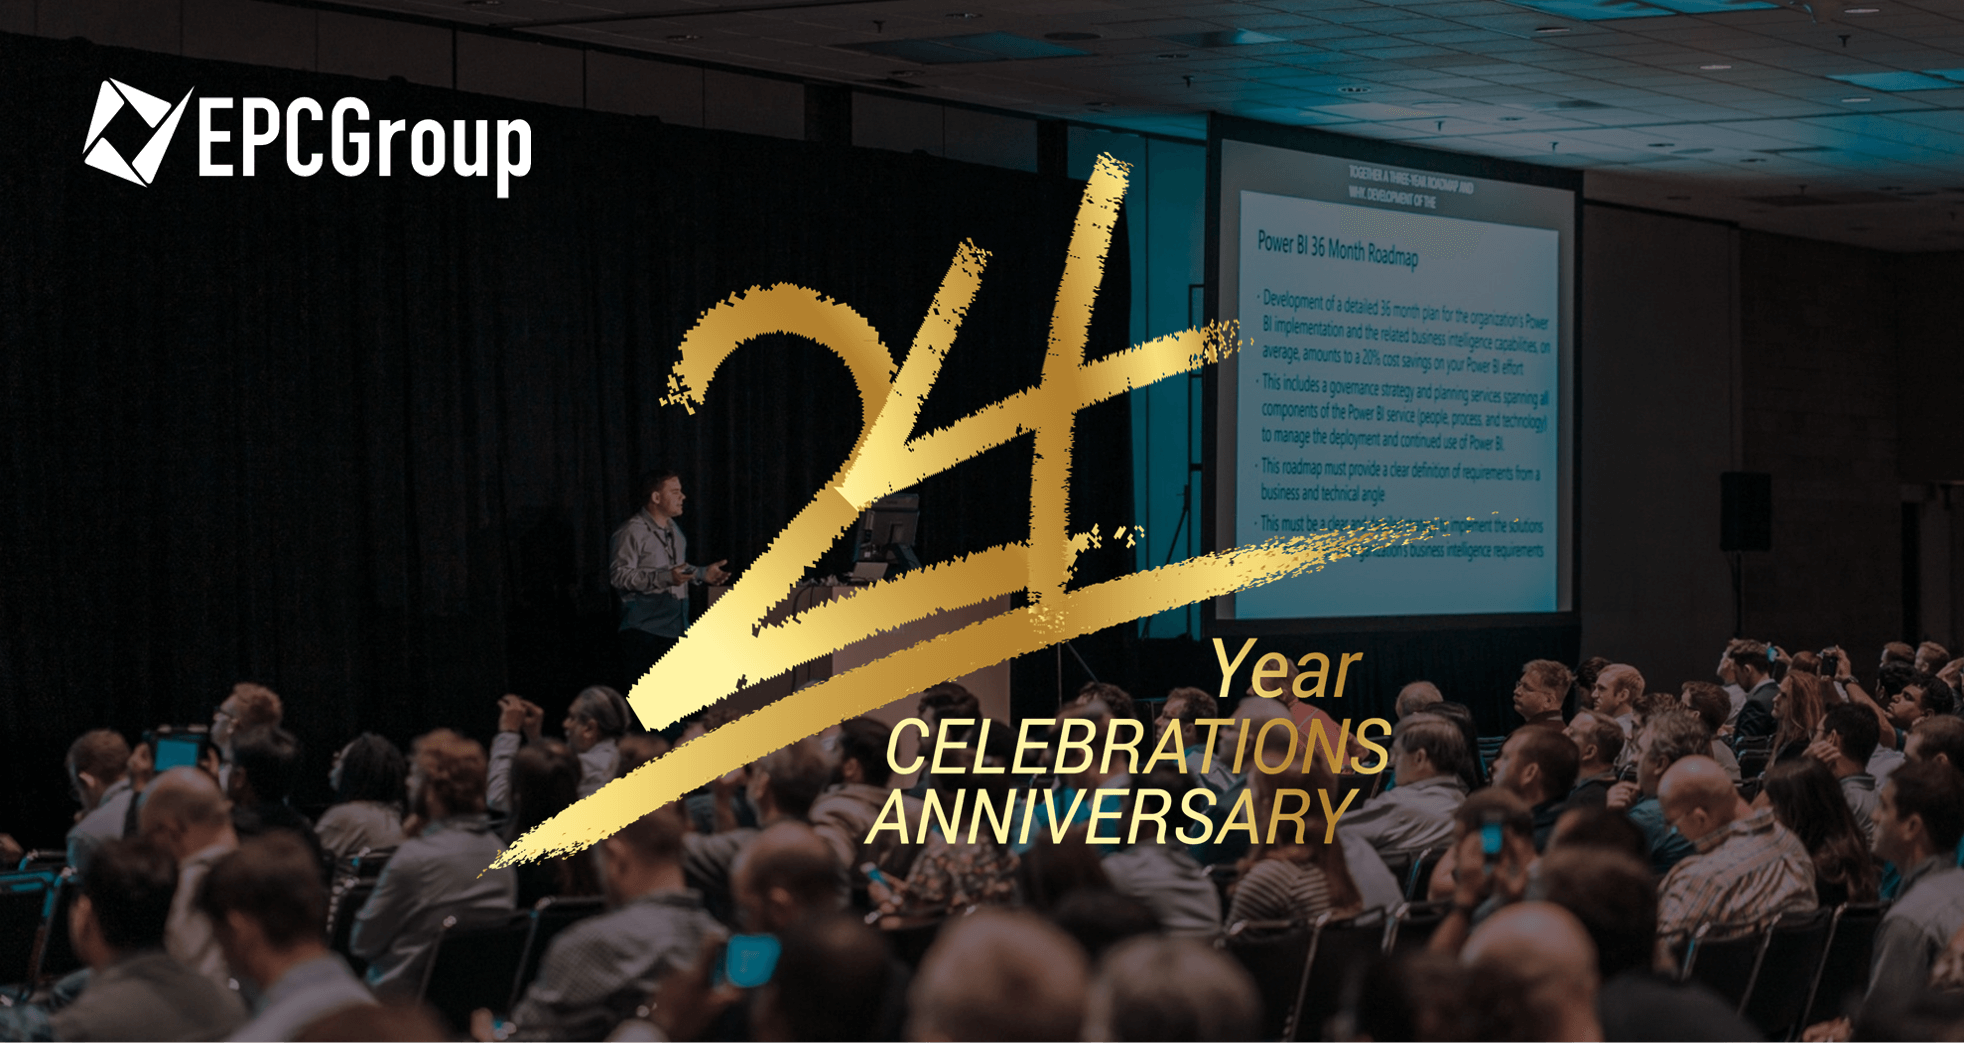 EPC Group Turns 24 Years Old. - thumb image